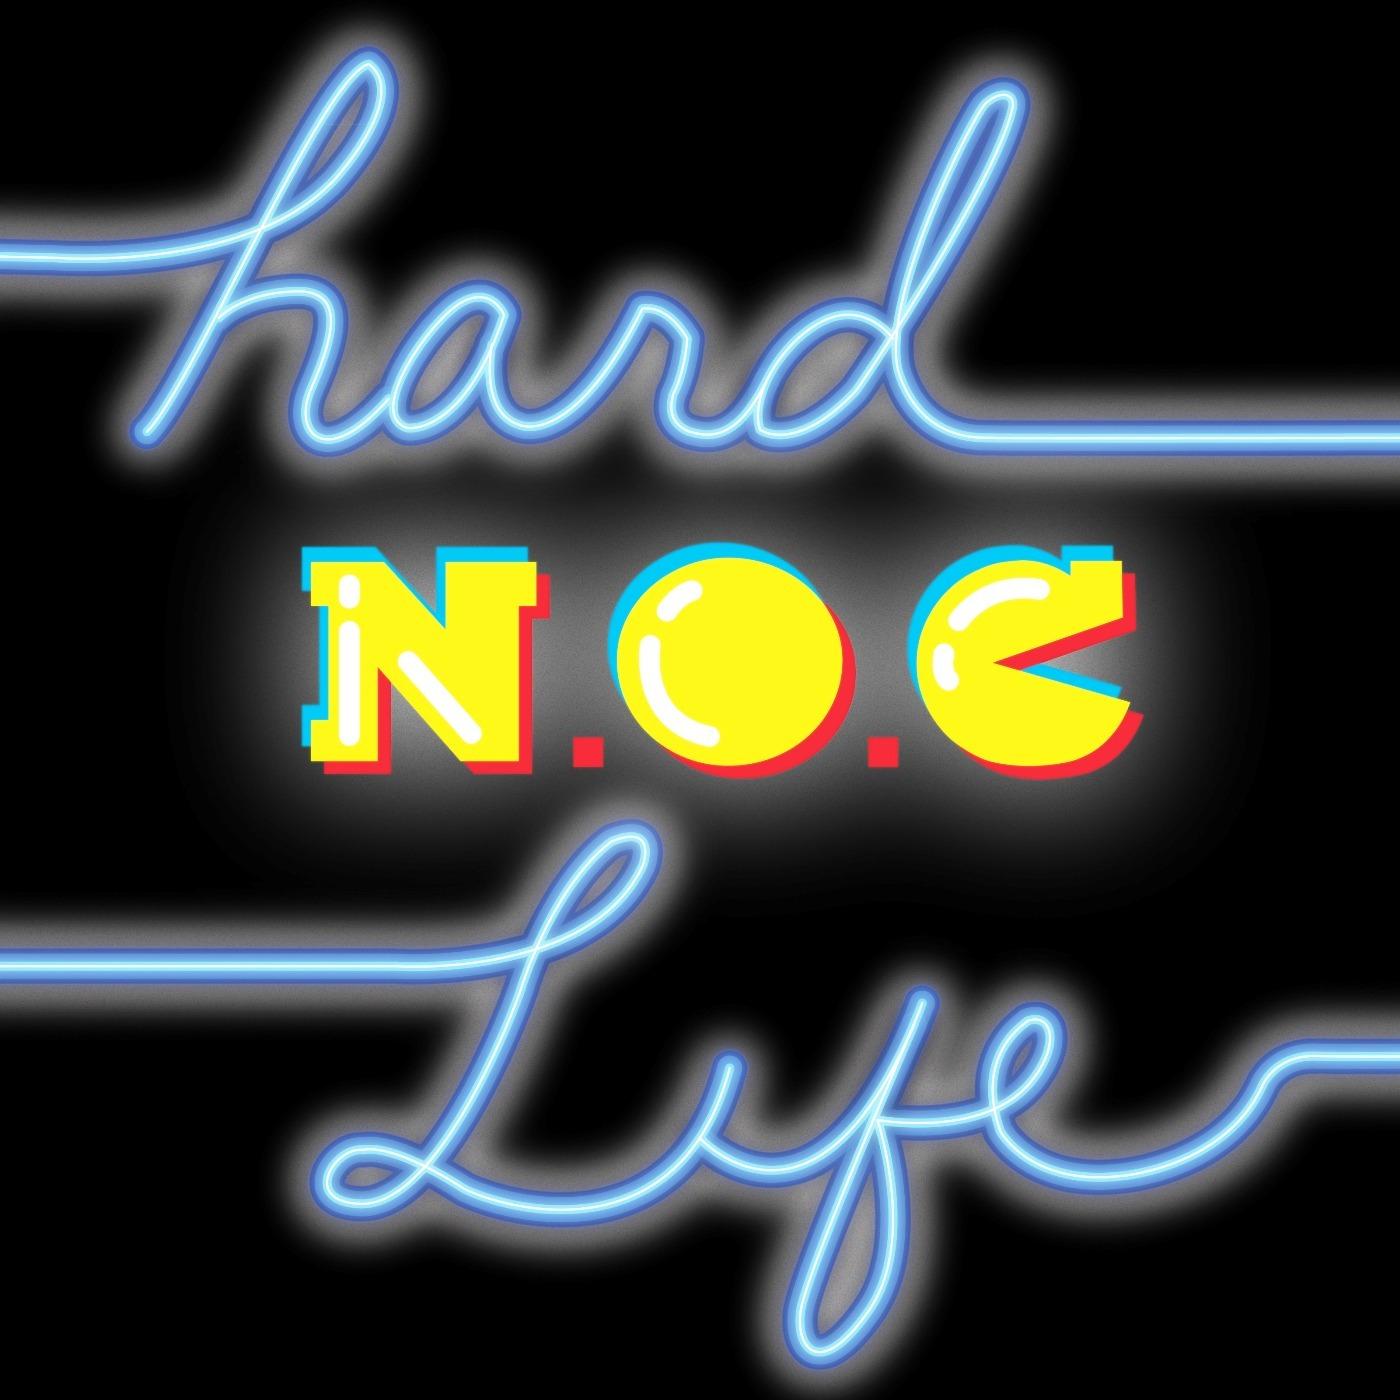 Hard N.O.C. Life